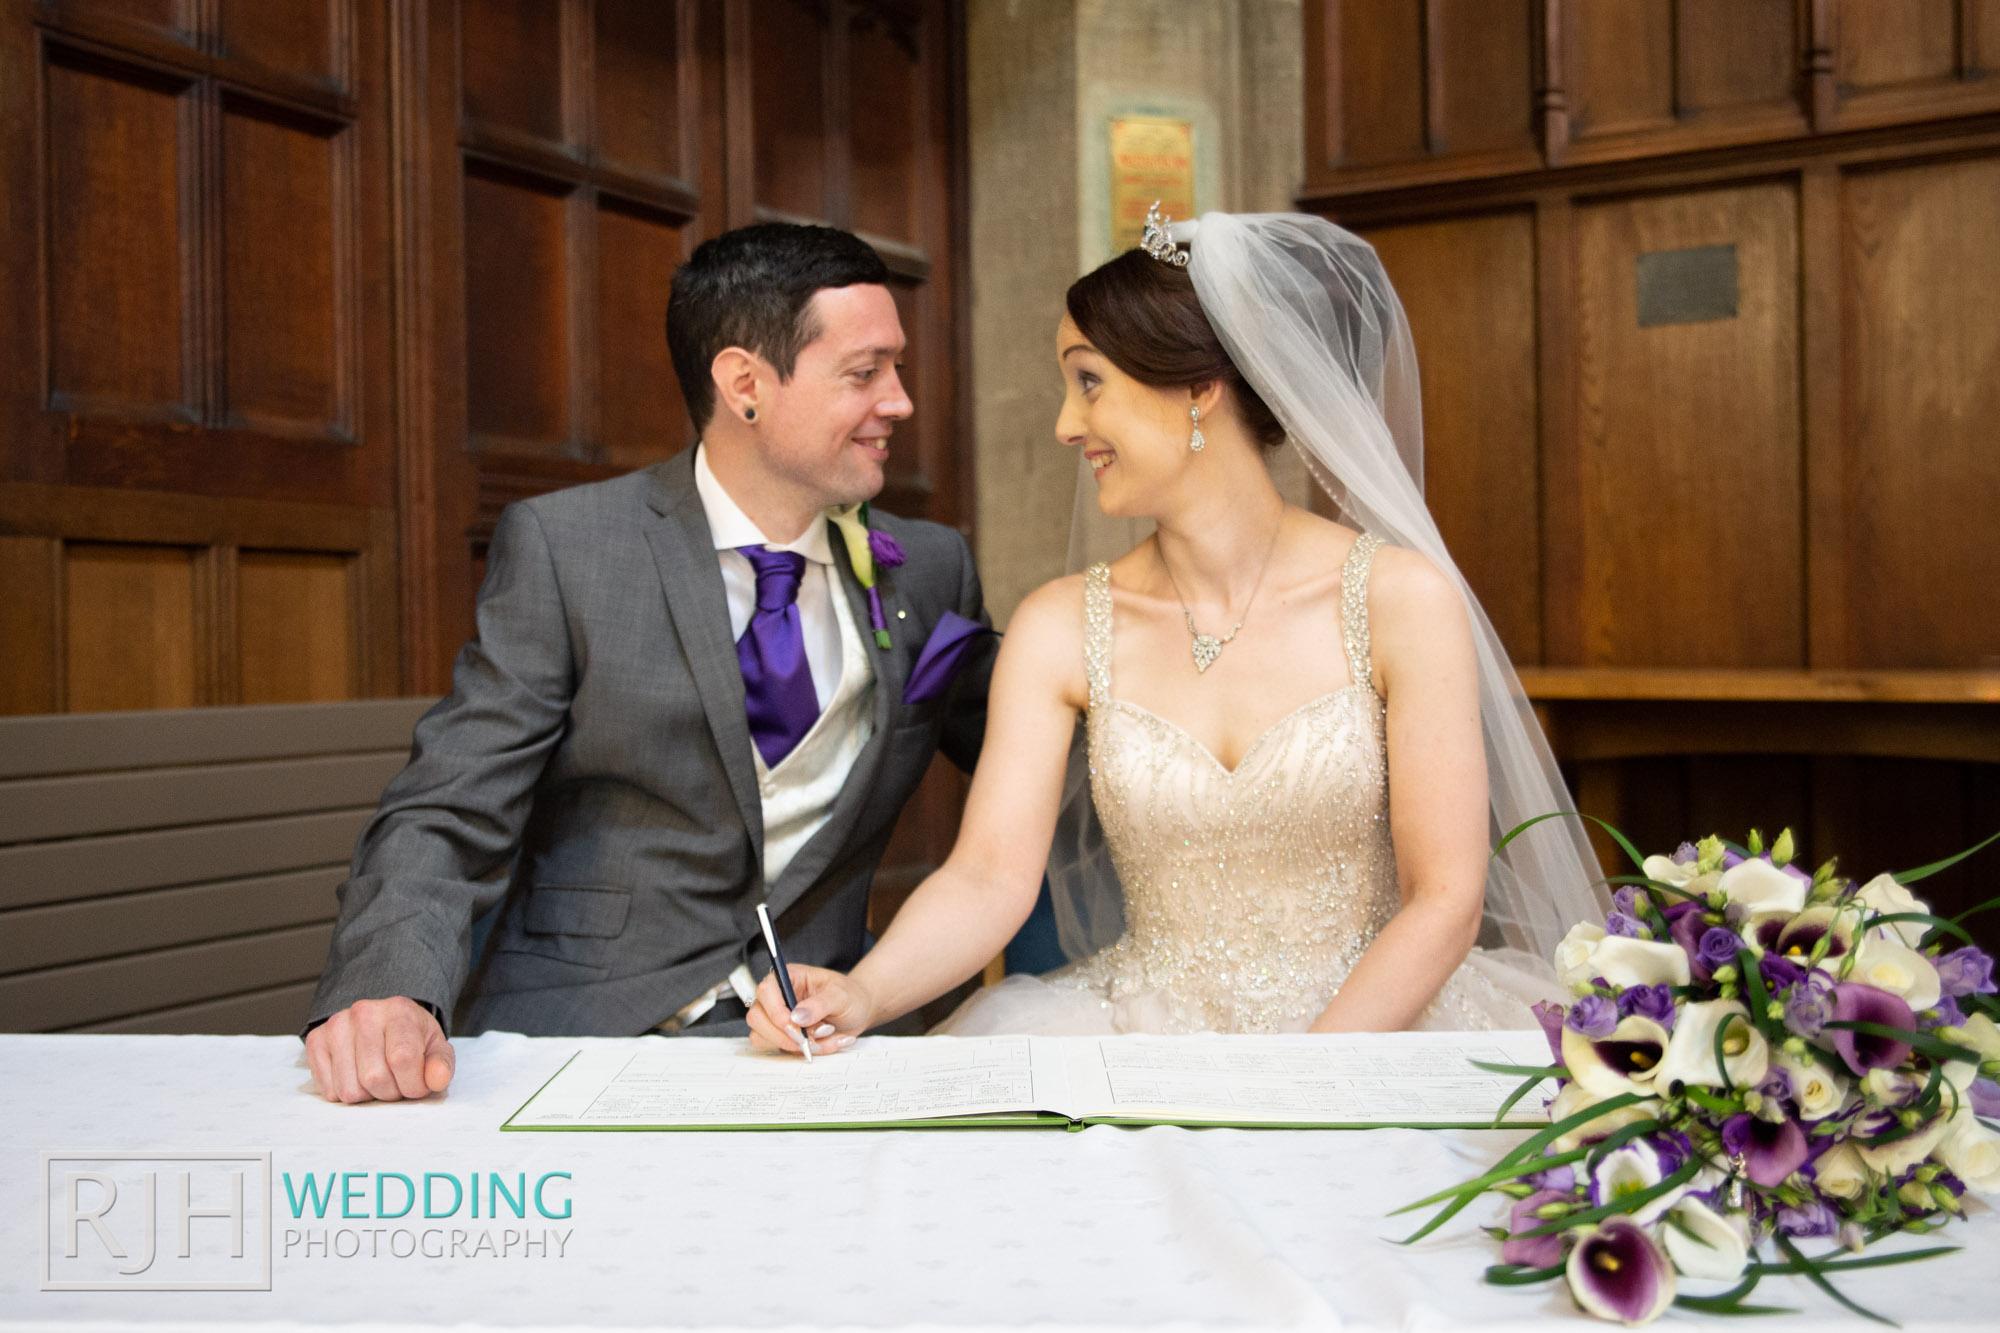 Oulton Hall Wedding Photography_Goodwill-Hall_027_IMG_6431.jpg